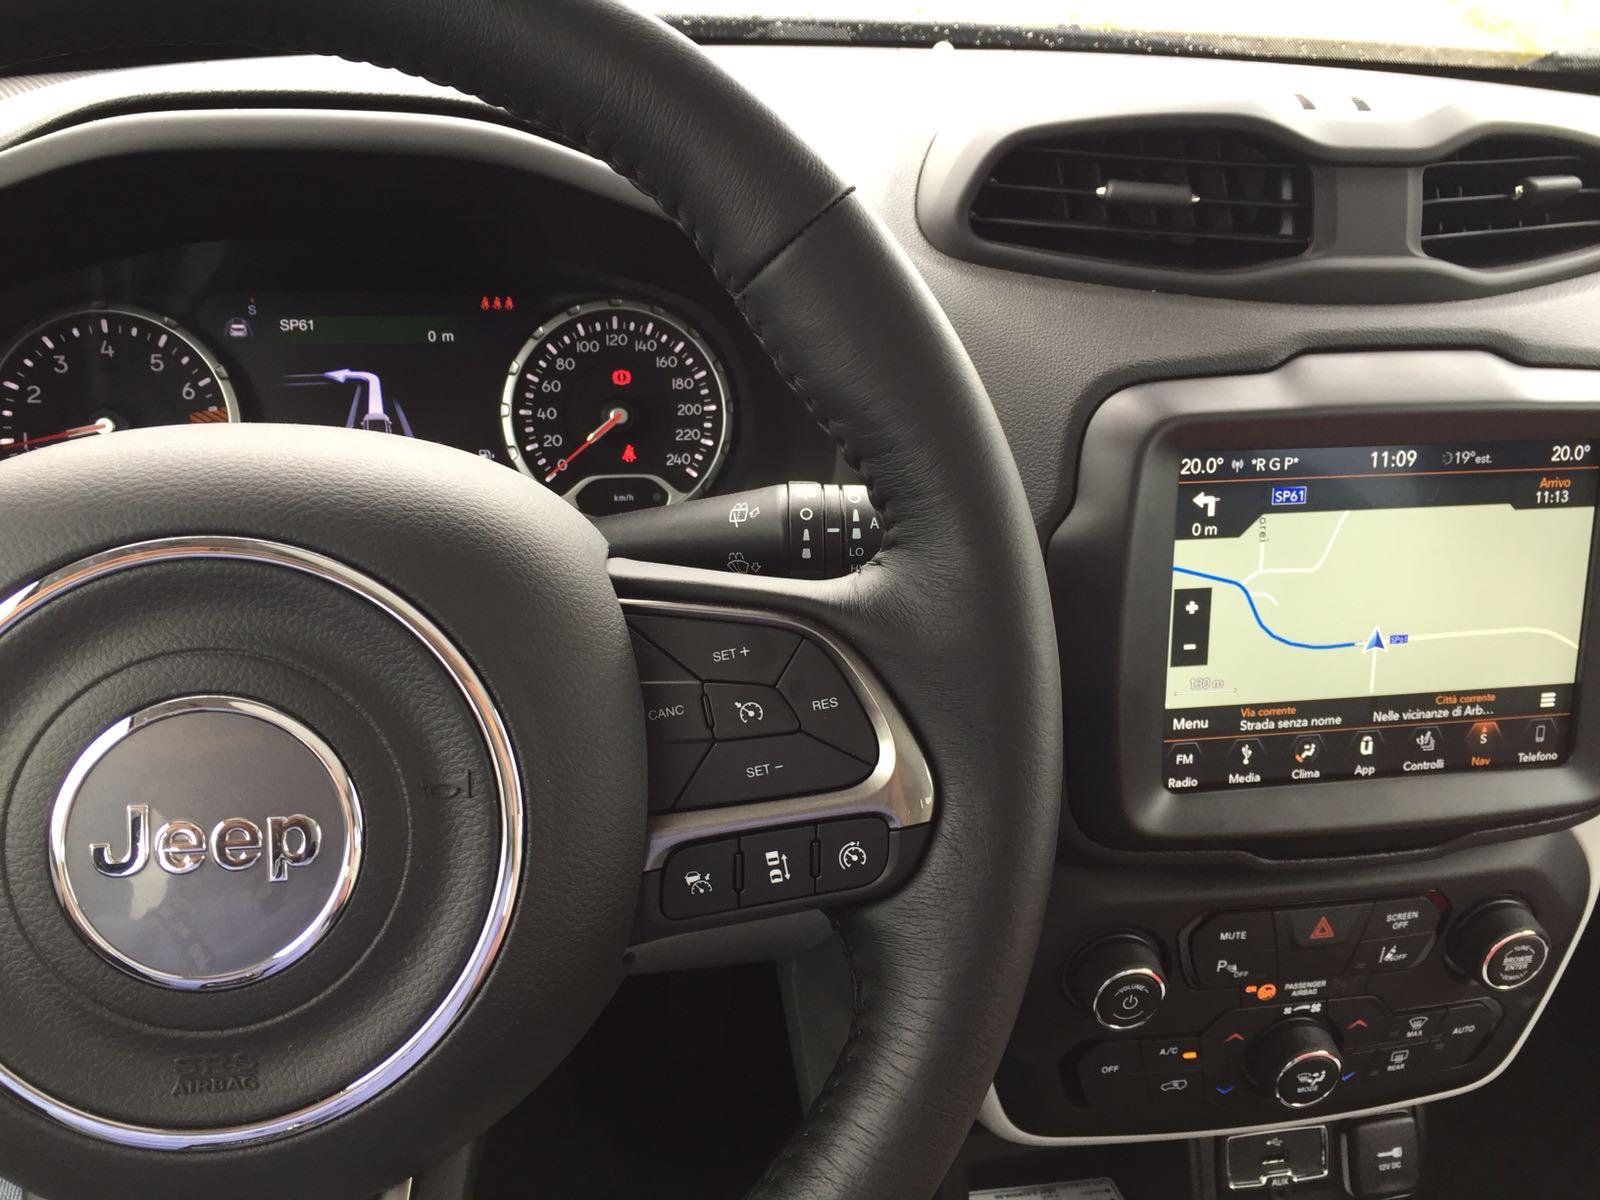 jeep-renegade-2019-volante-infotainment